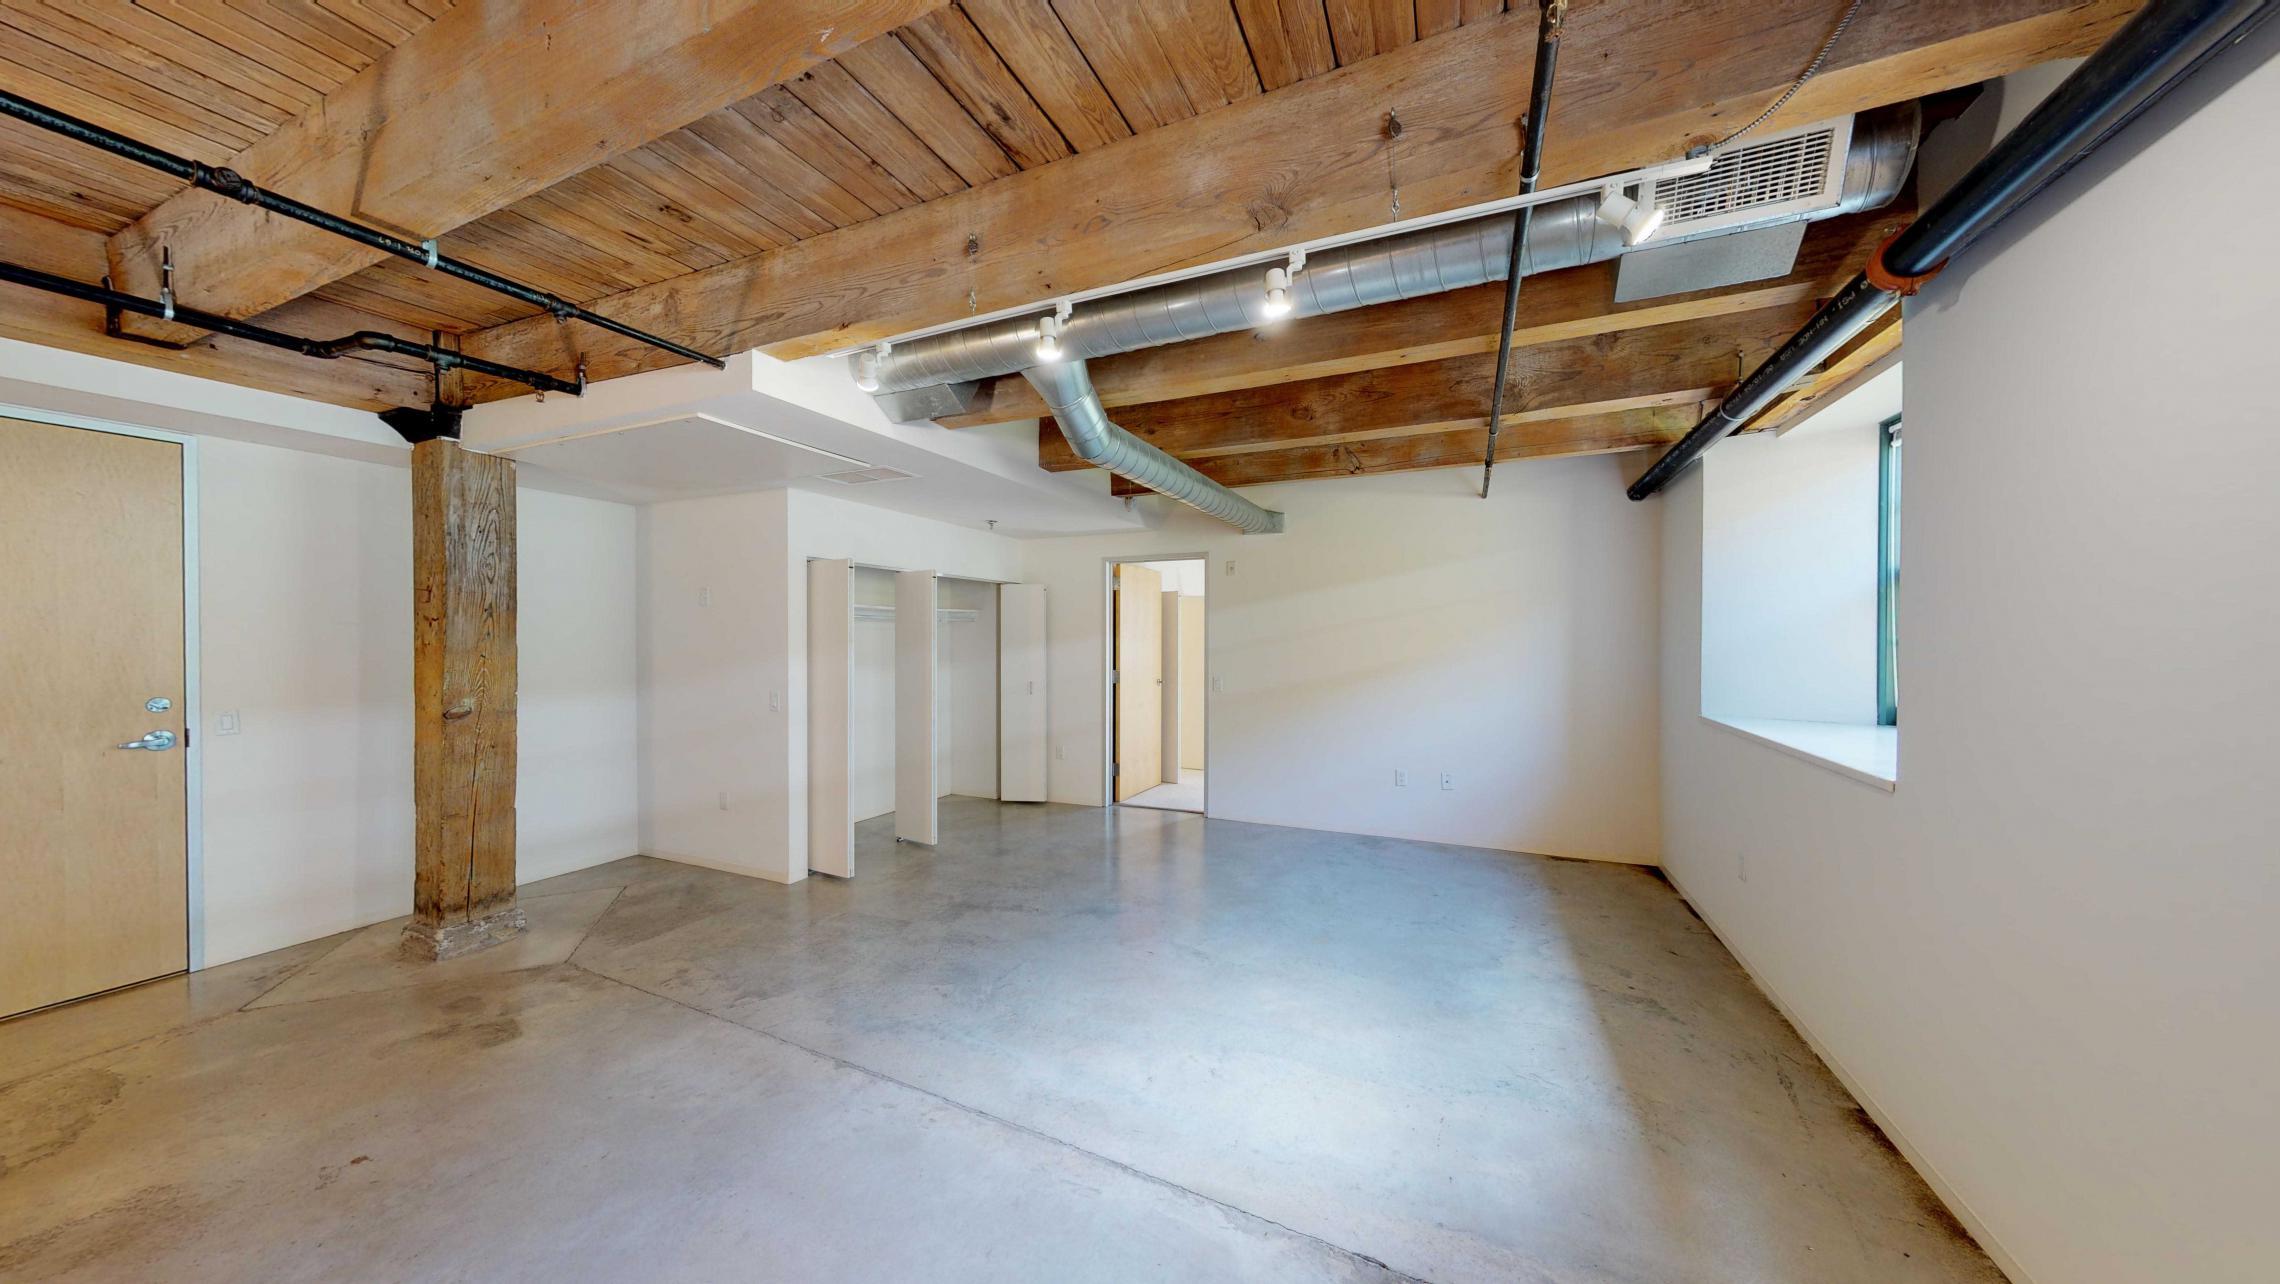 Tobacco-Lofts-Apartment-E102-Historic-Design-Downtown-Polished-Concrete-Madison-capitol-modern-upscale-lake